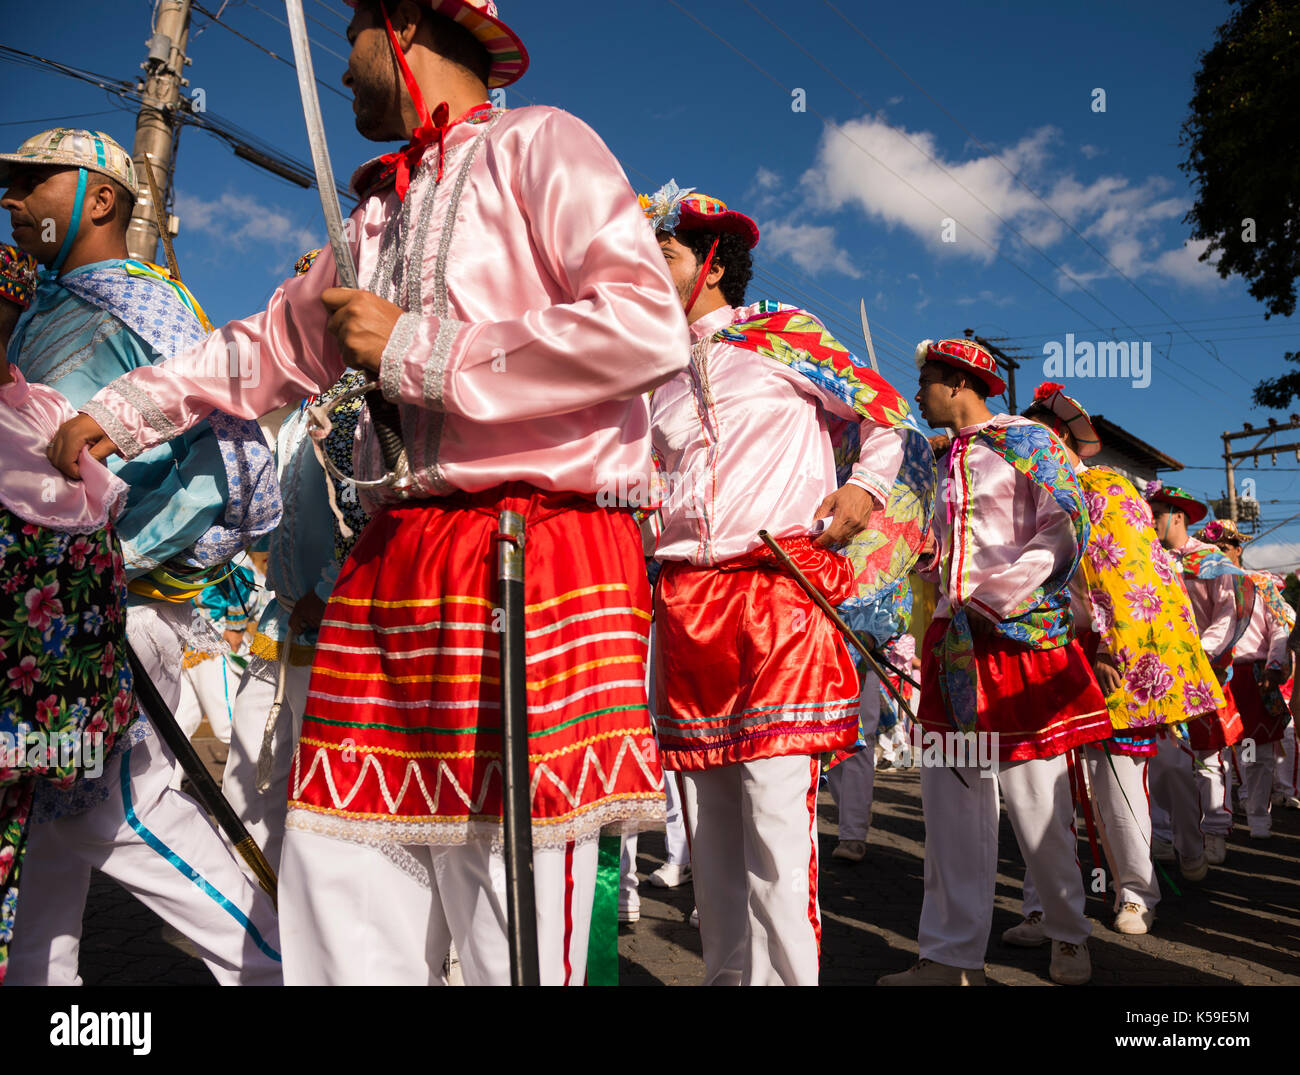 La festividad religiosa de la congada, de Ilhabela, SP, Brasil Imagen De Stock